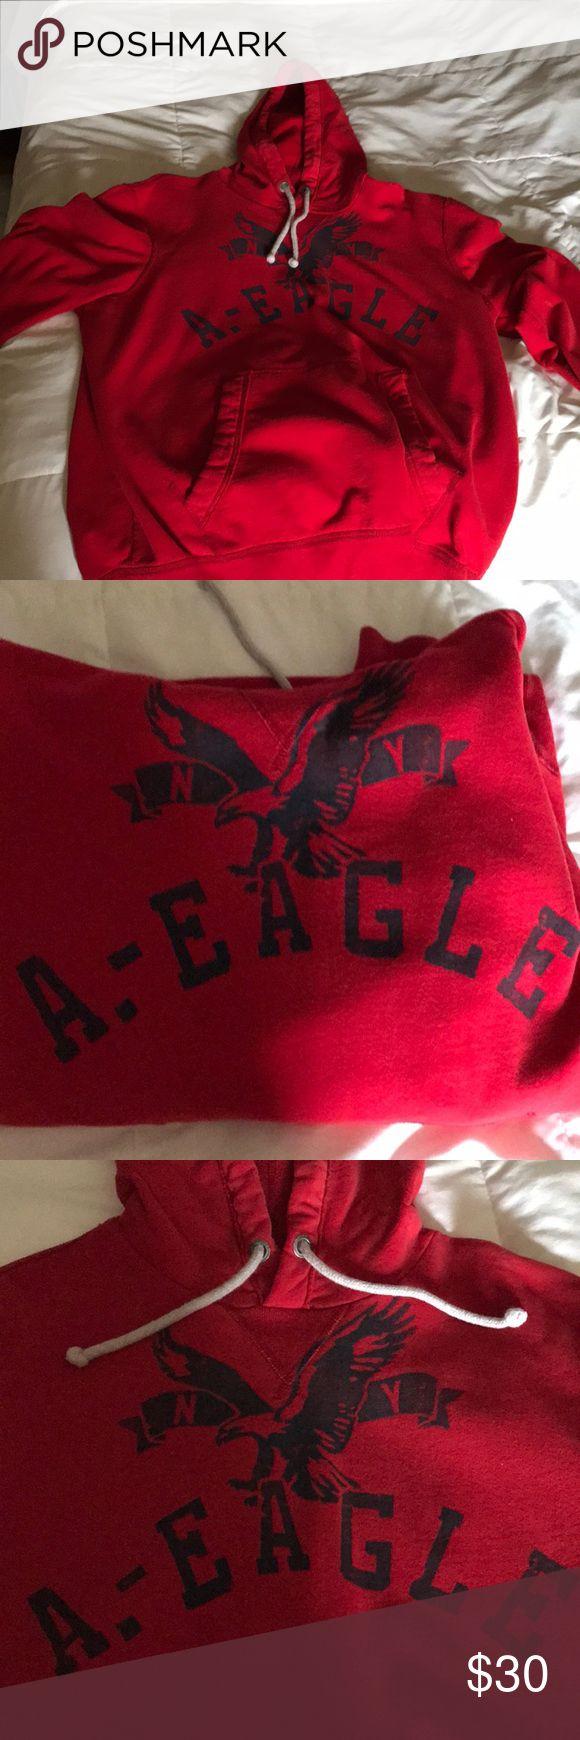 Red American Eagle Sweatshirt Red American Eagle sweatshirt, Youth Large (fits like a regular medium), very comfortable American Eagle Outfitters Shirts & Tops Sweatshirts & Hoodies